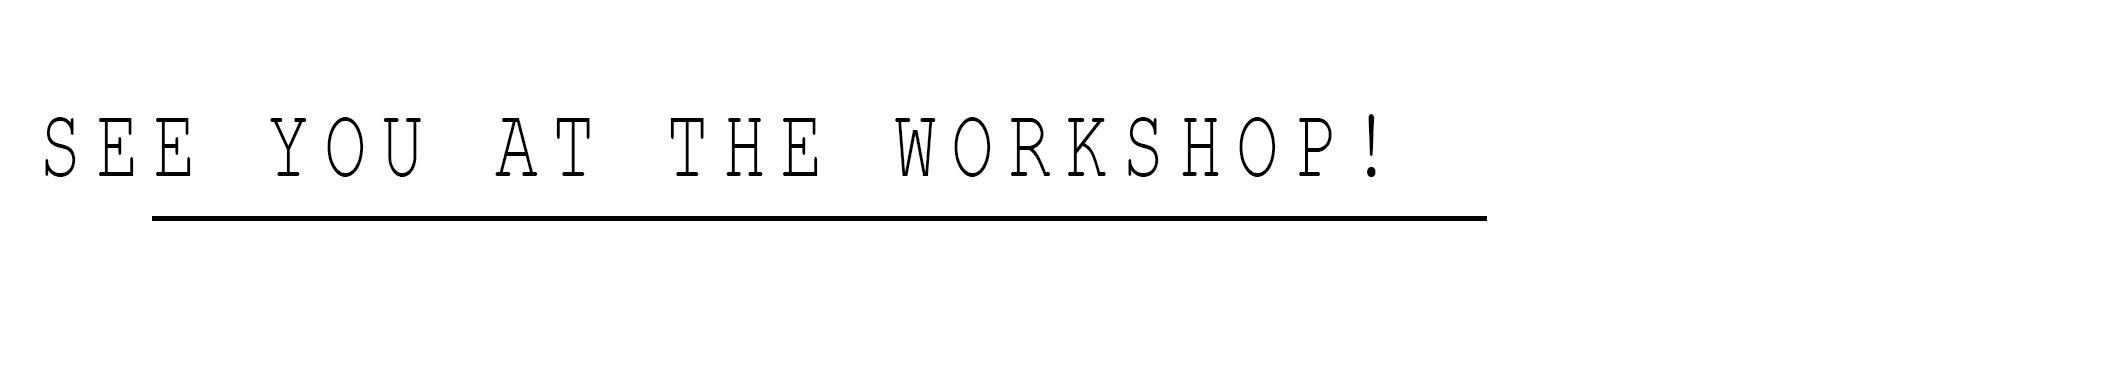 SeeYouAtTheWorkshop.jpg